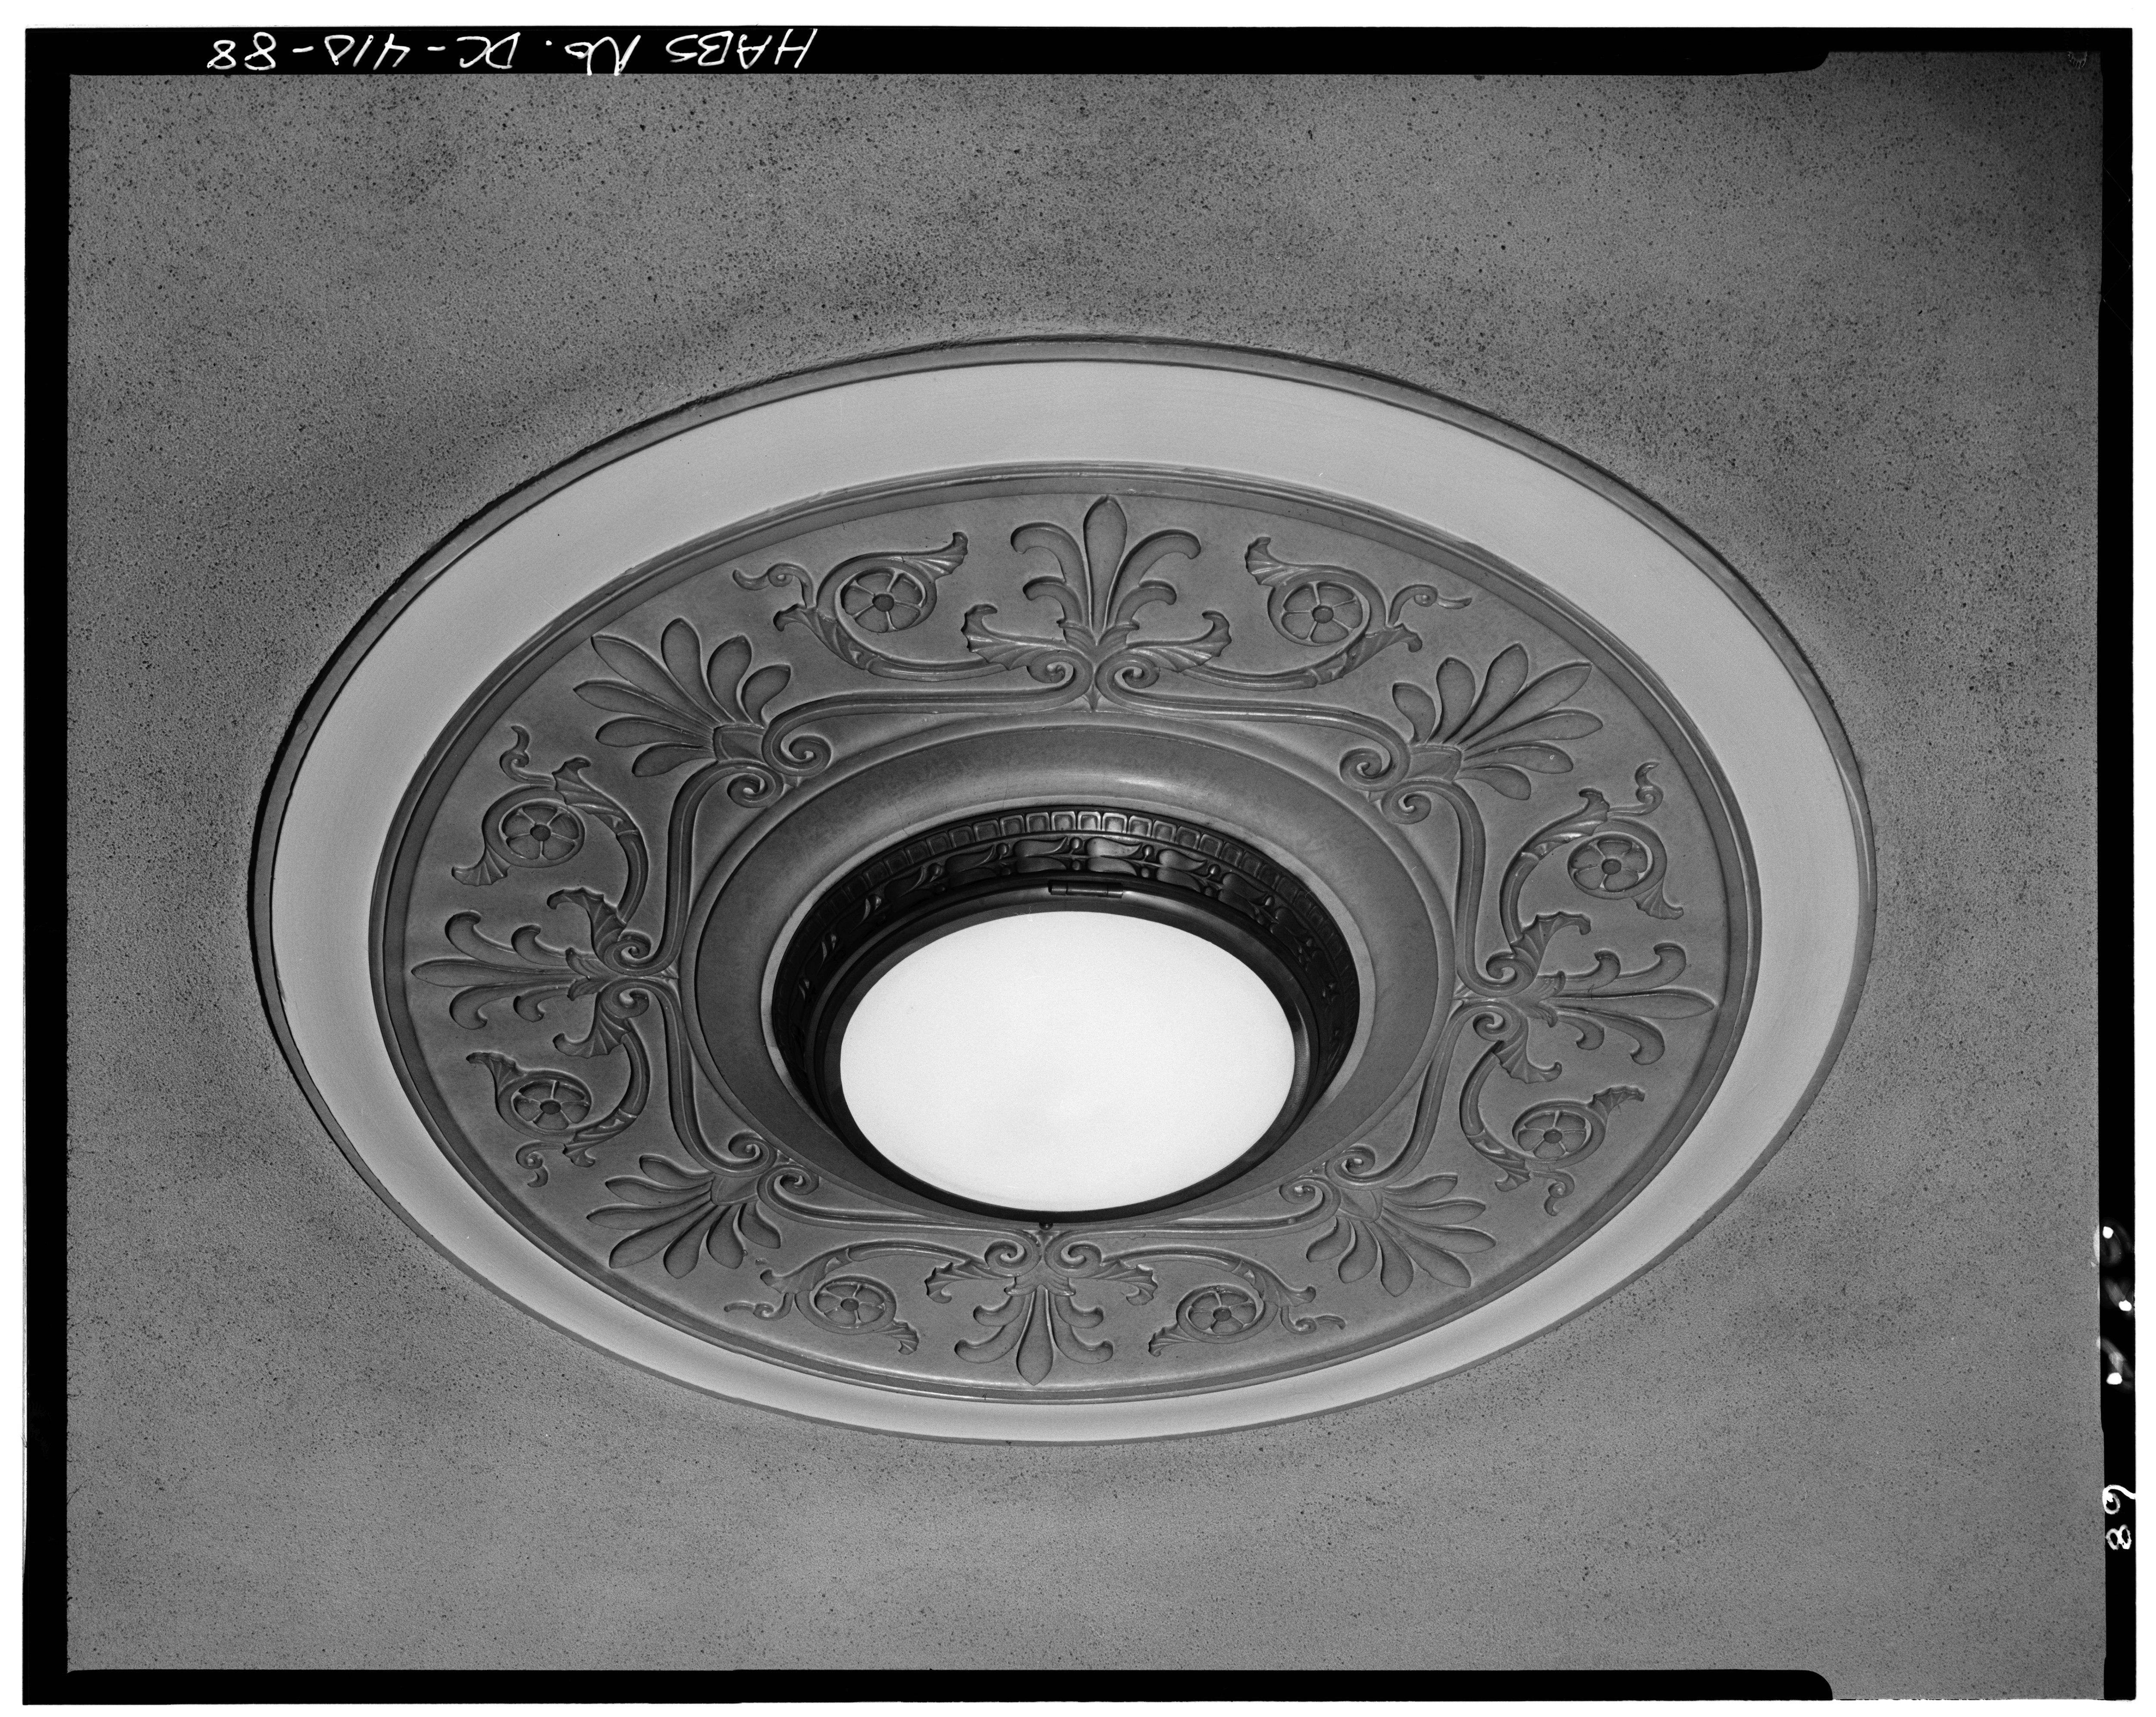 Foyer Ceiling Medallion : File interior second floor north entrance foyer